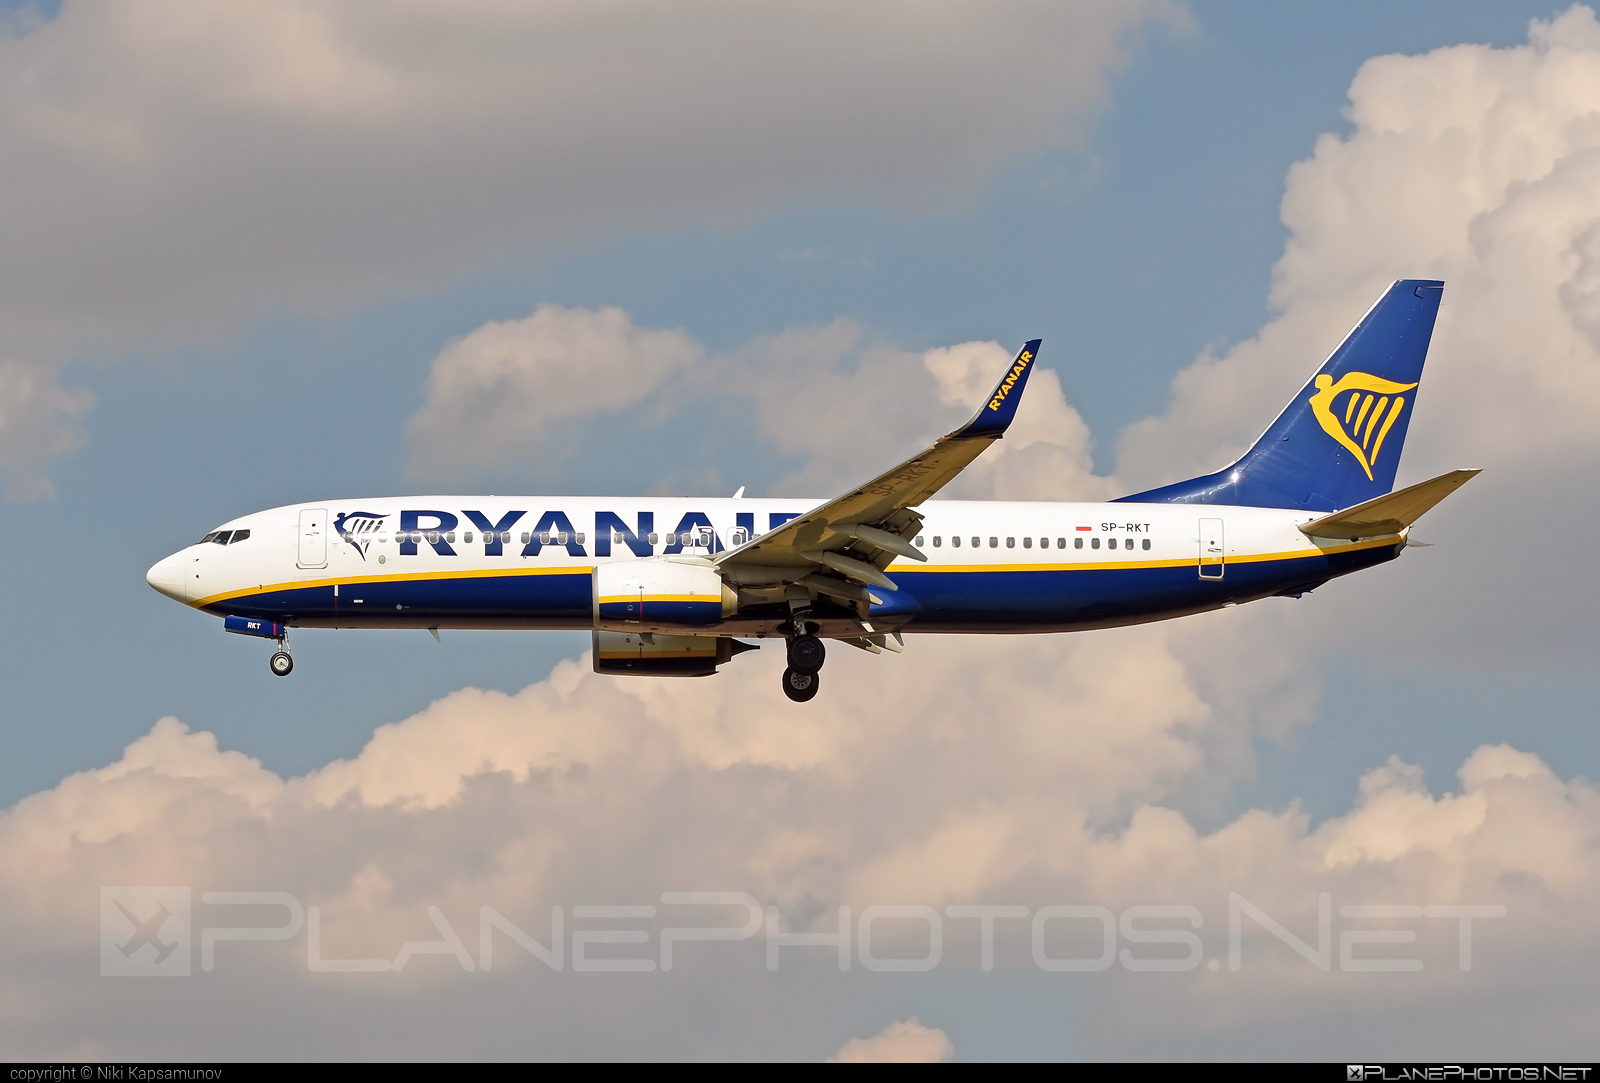 Boeing 737-800 - SP-RKT operated by Ryanair Sun #b737 #b737nextgen #b737ng #boeing #boeing737 #ryanair #ryanairsun